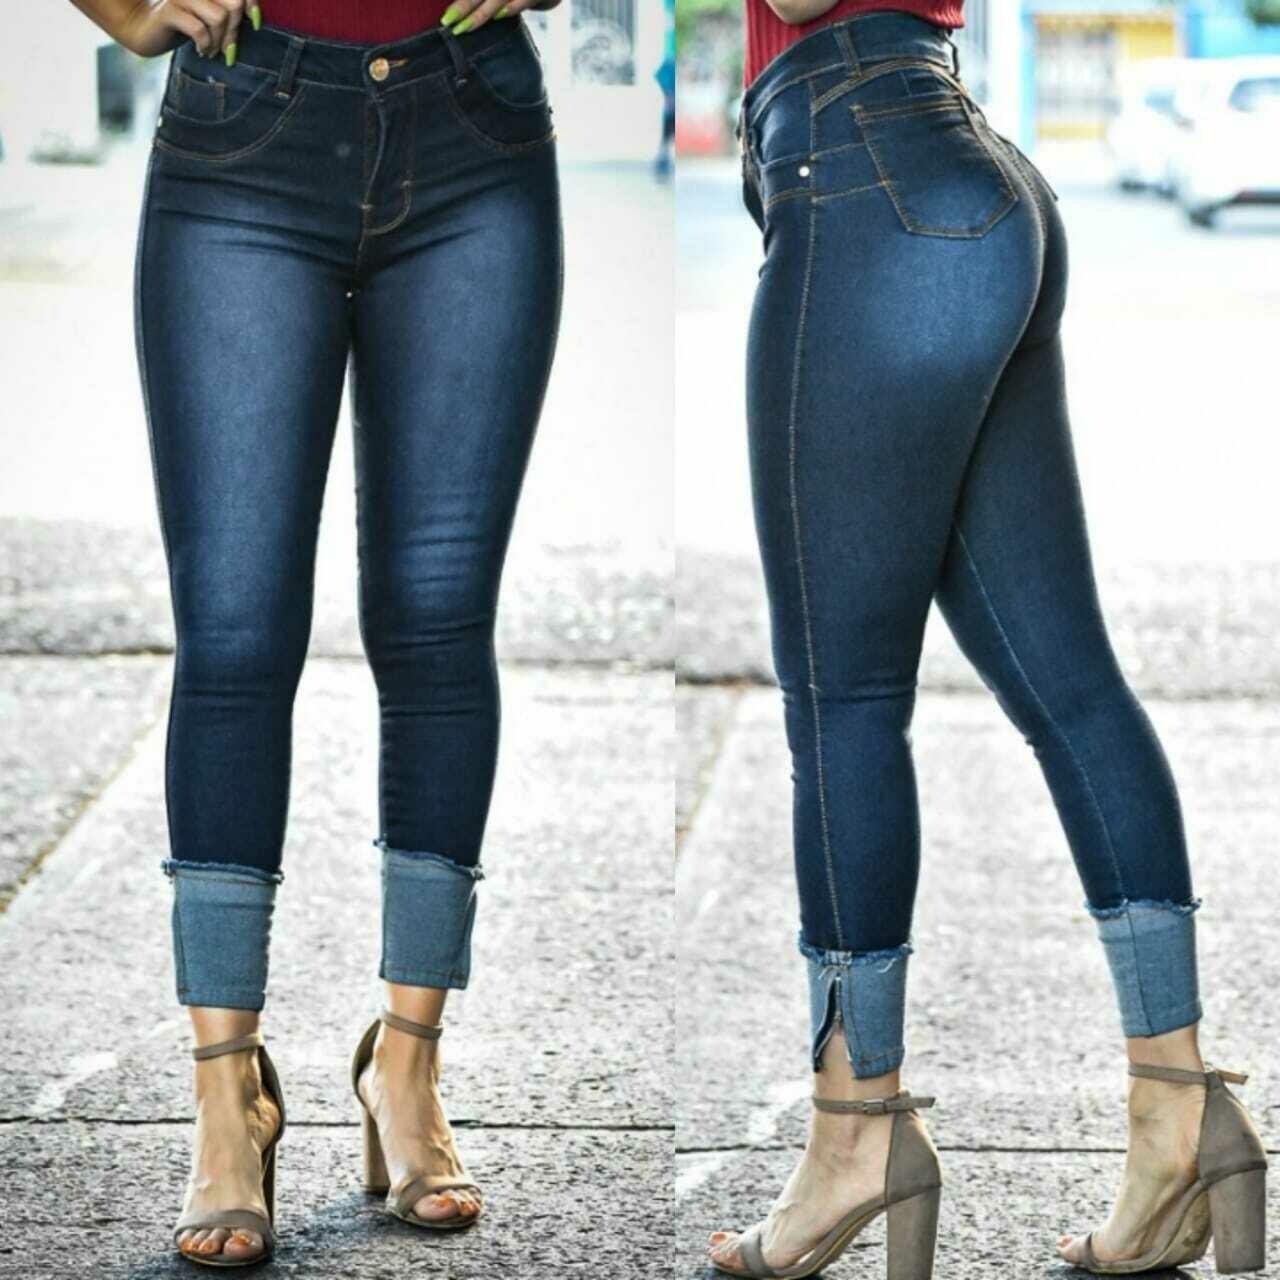 Pantalon mezclilla para dama tobillero corte a la cintura